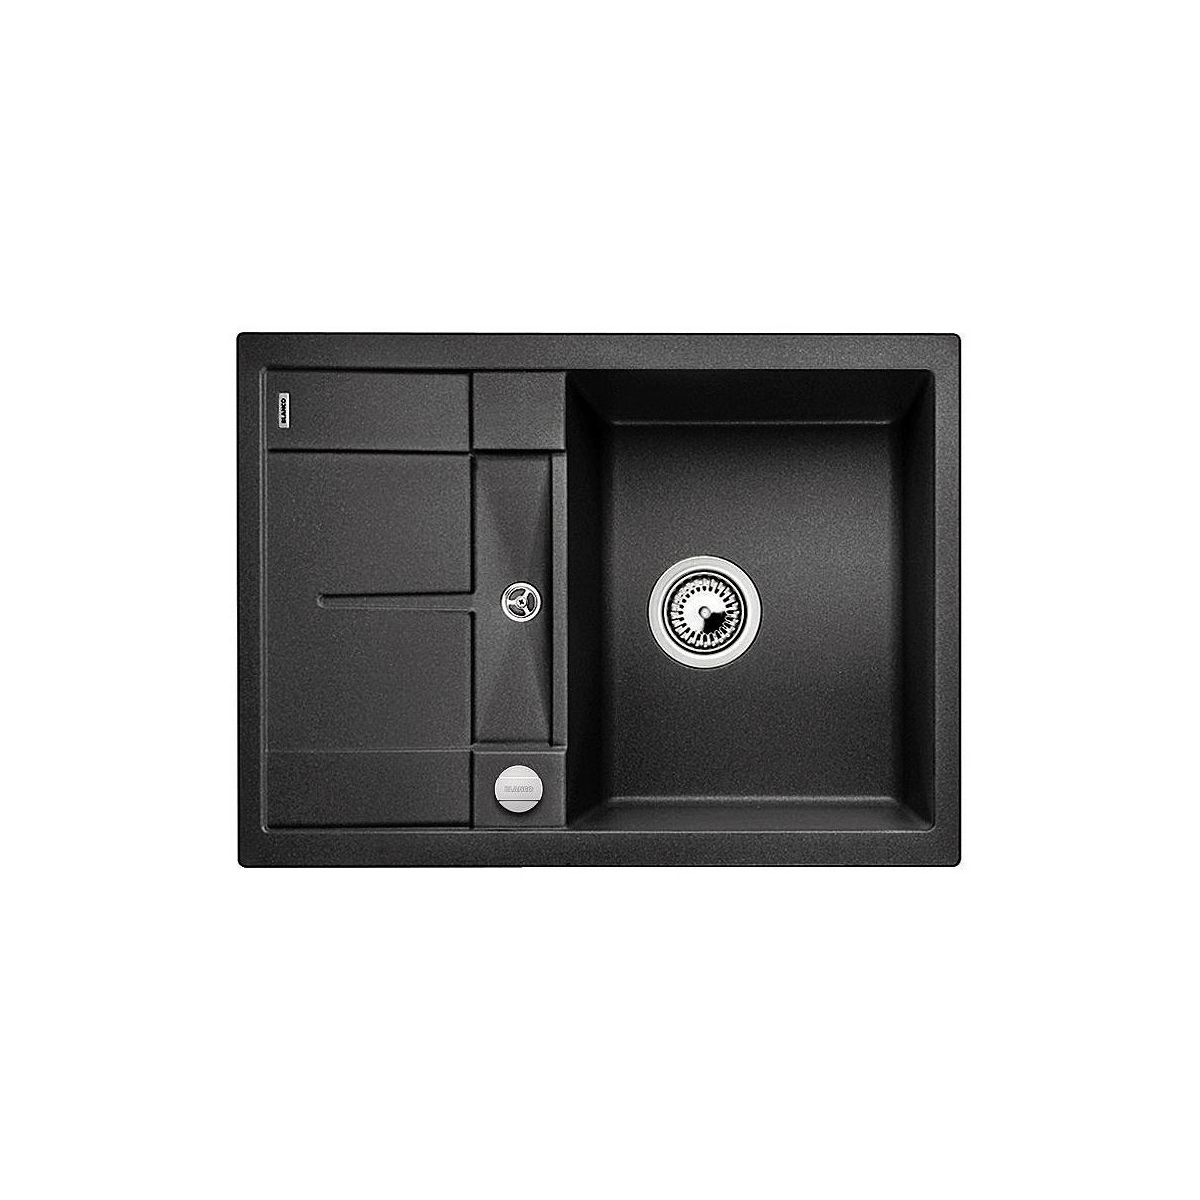 zlewozmywak metra 45 s compact blanco zlewozmywaki. Black Bedroom Furniture Sets. Home Design Ideas